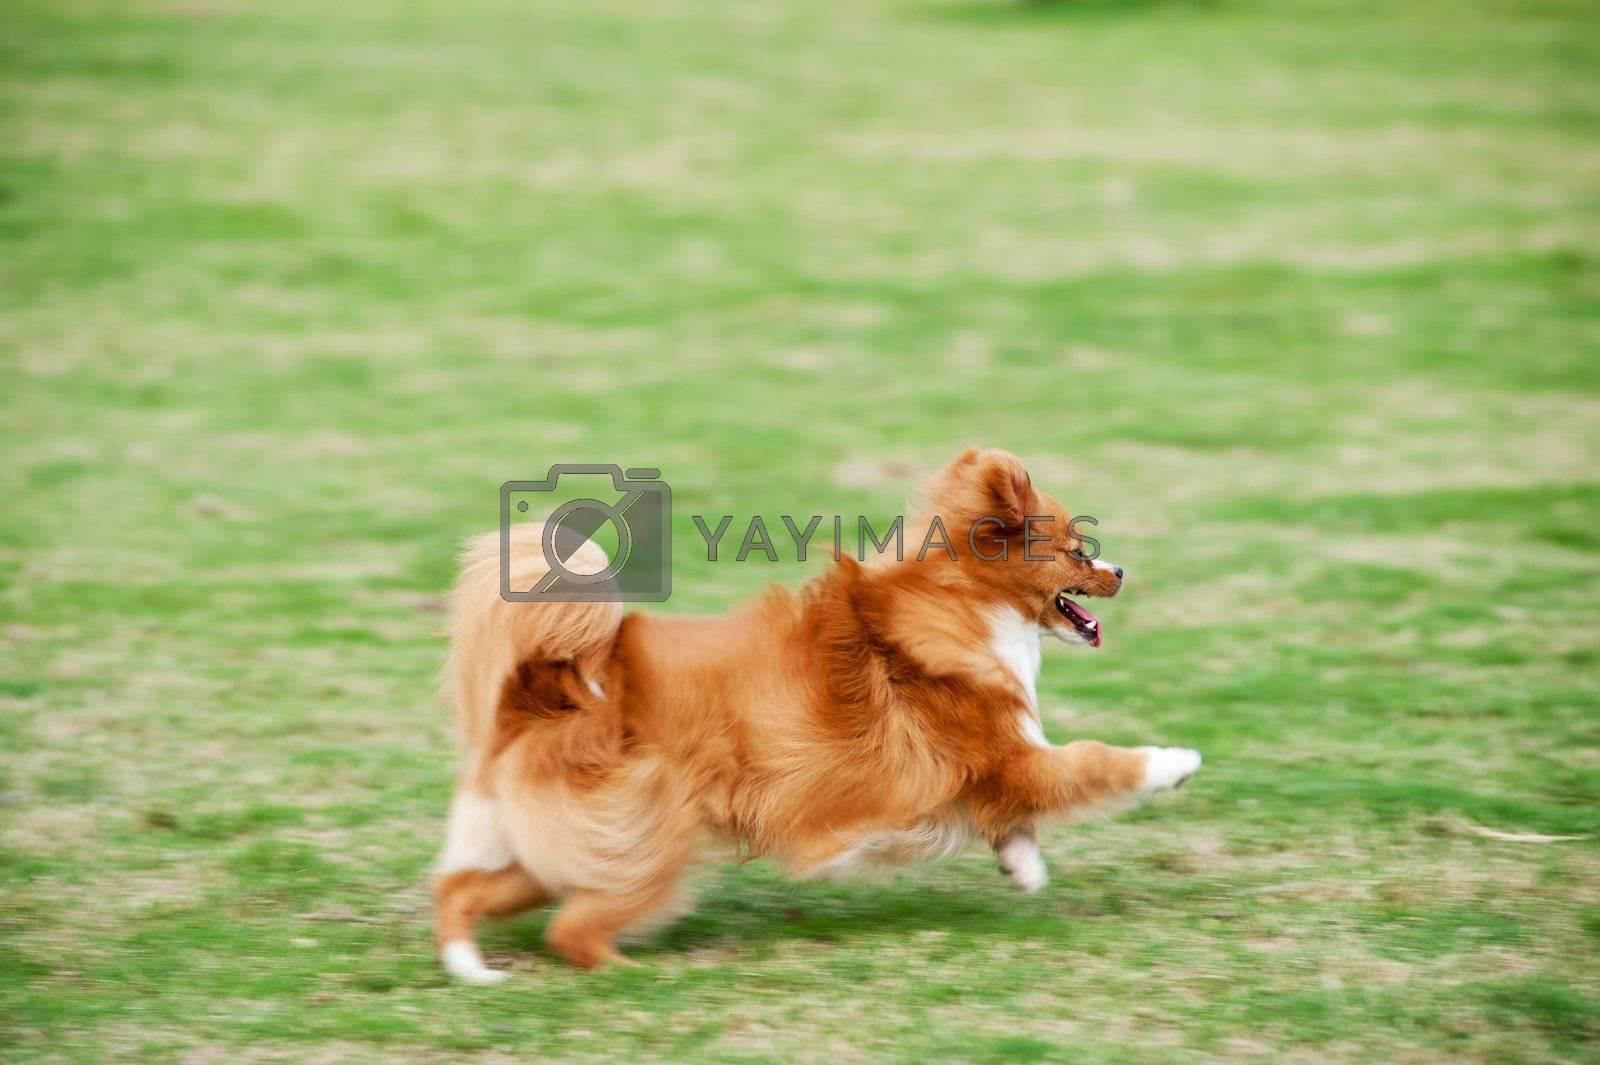 Pomeranian dog running fast on the lawn